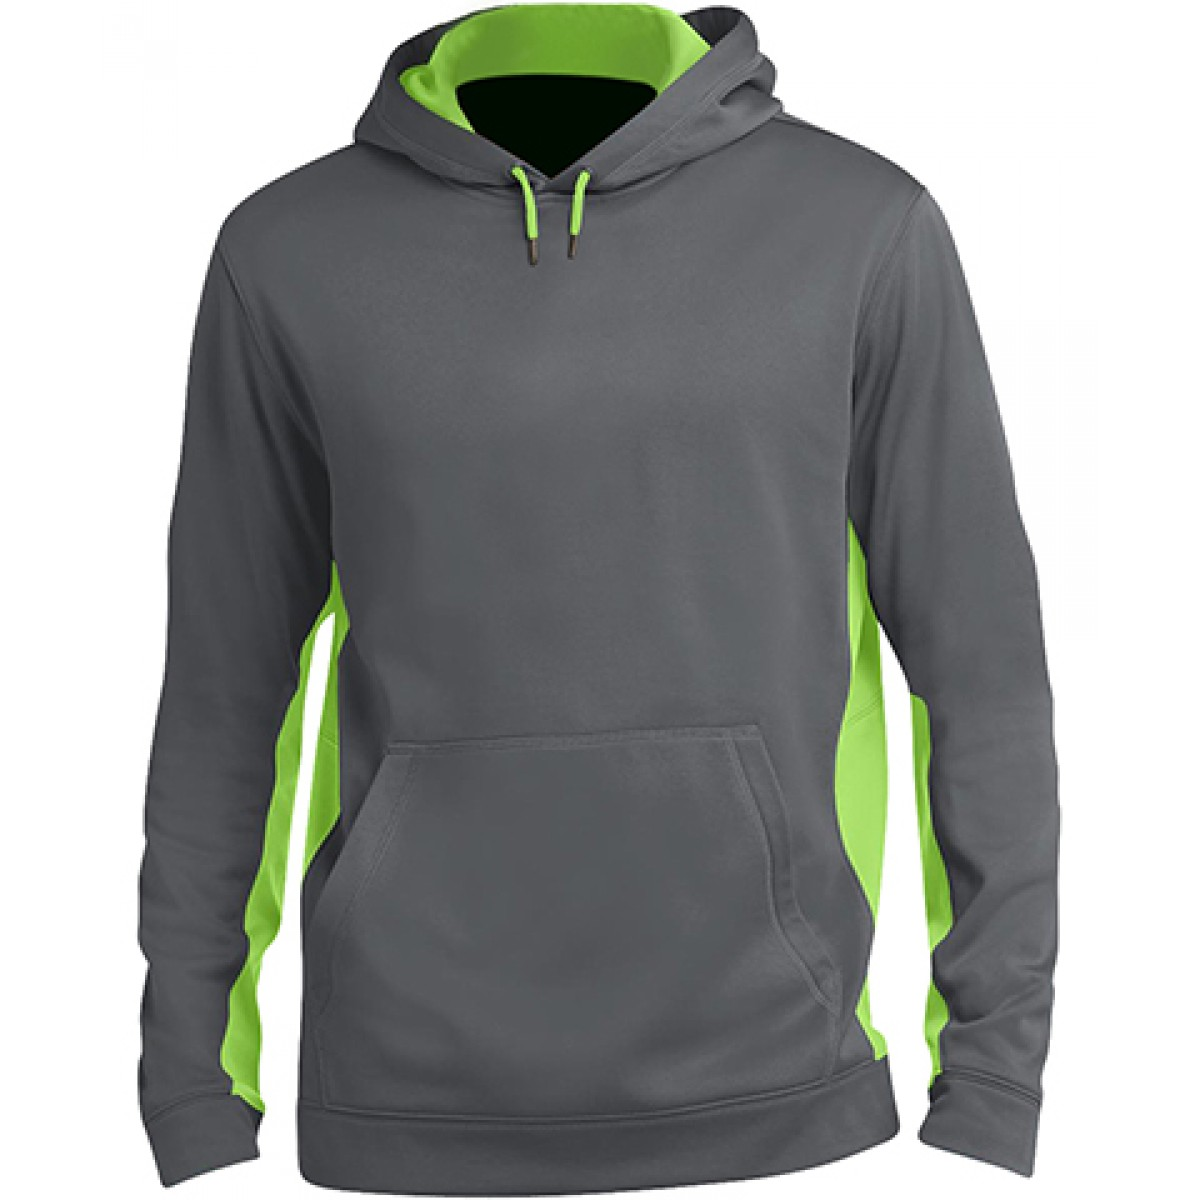 Fleece Colorblock Hooded Pullover-Gray/Green-XL